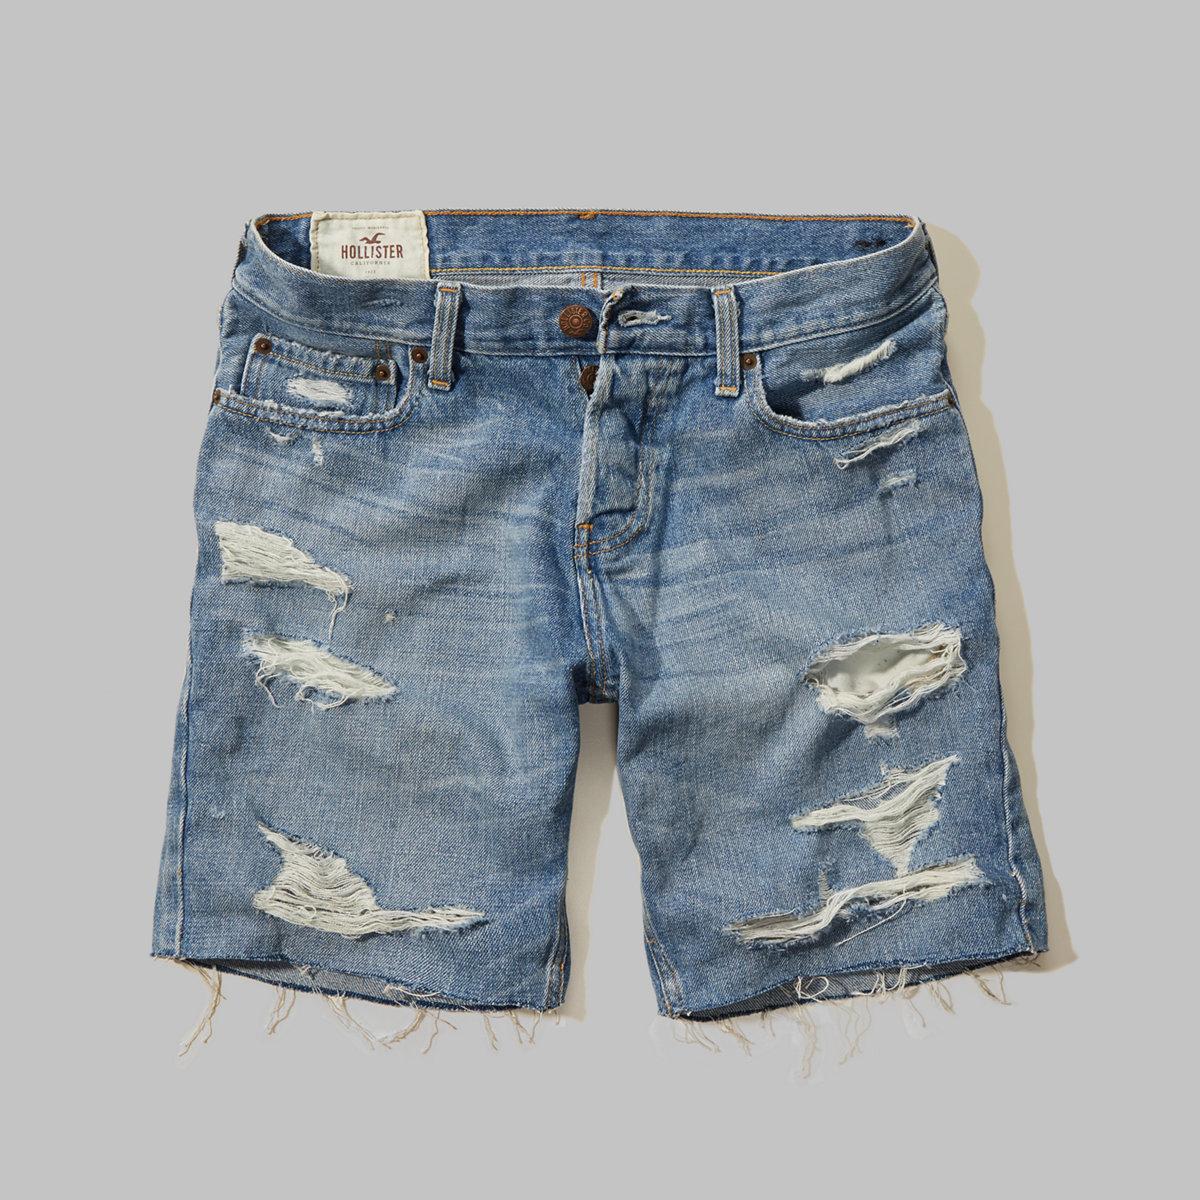 Hollister Prep Fit Denim Shorts